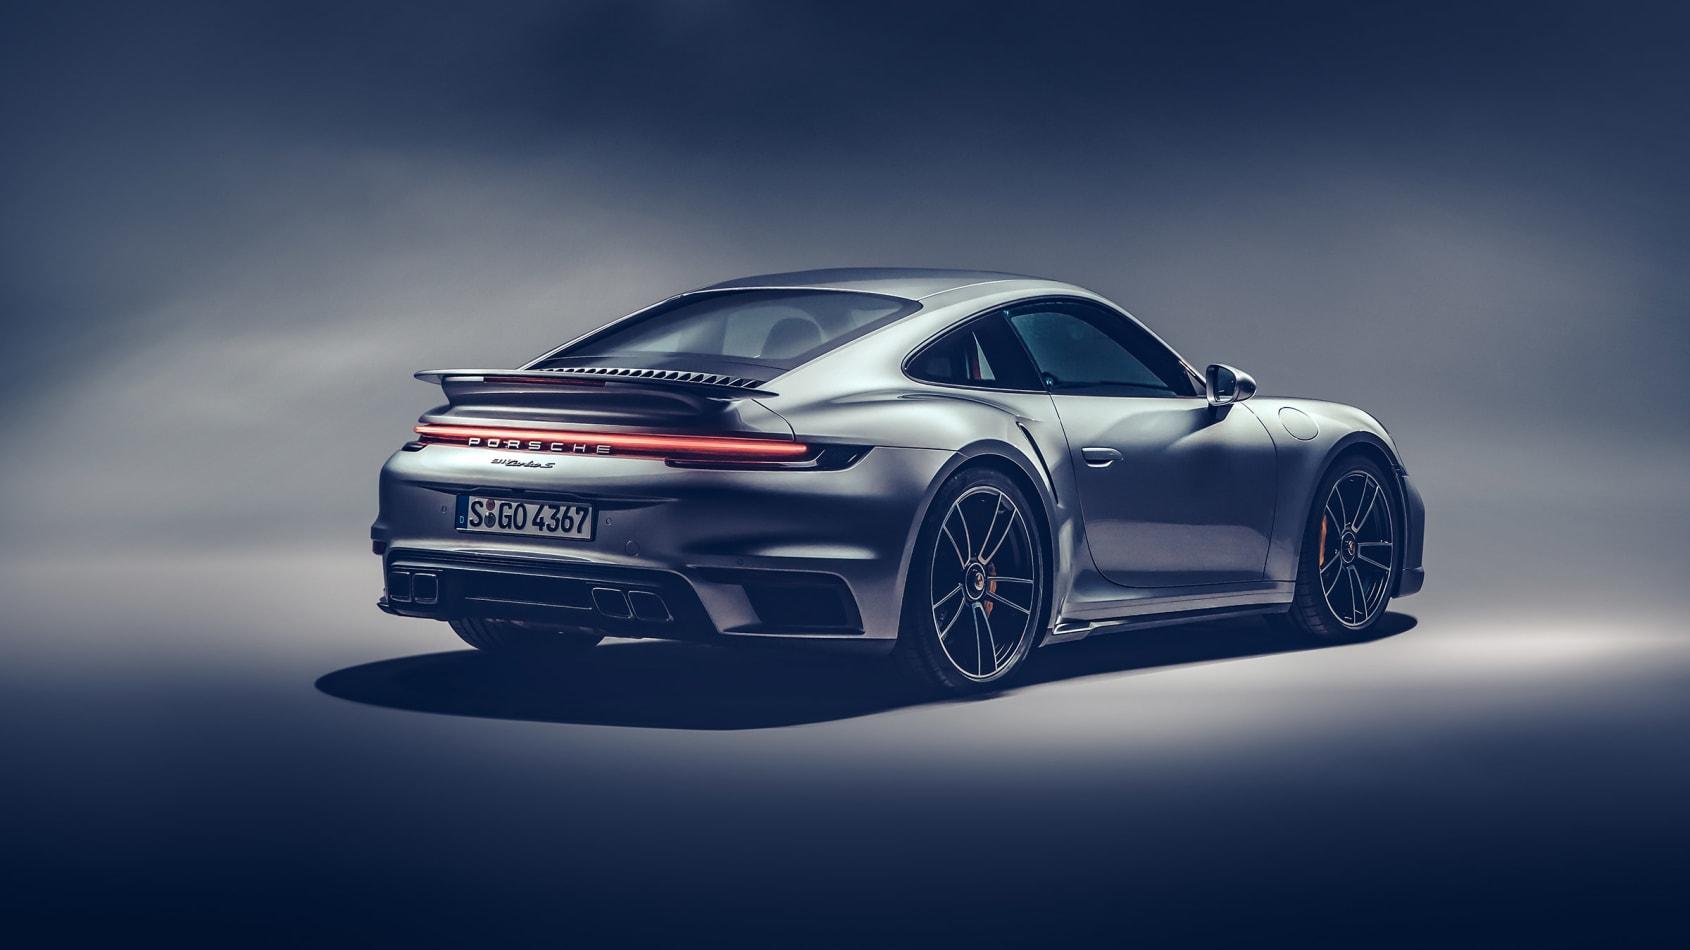 Petrolhead Corner - 2020 Porsche 911 Turbo S 992 - 3